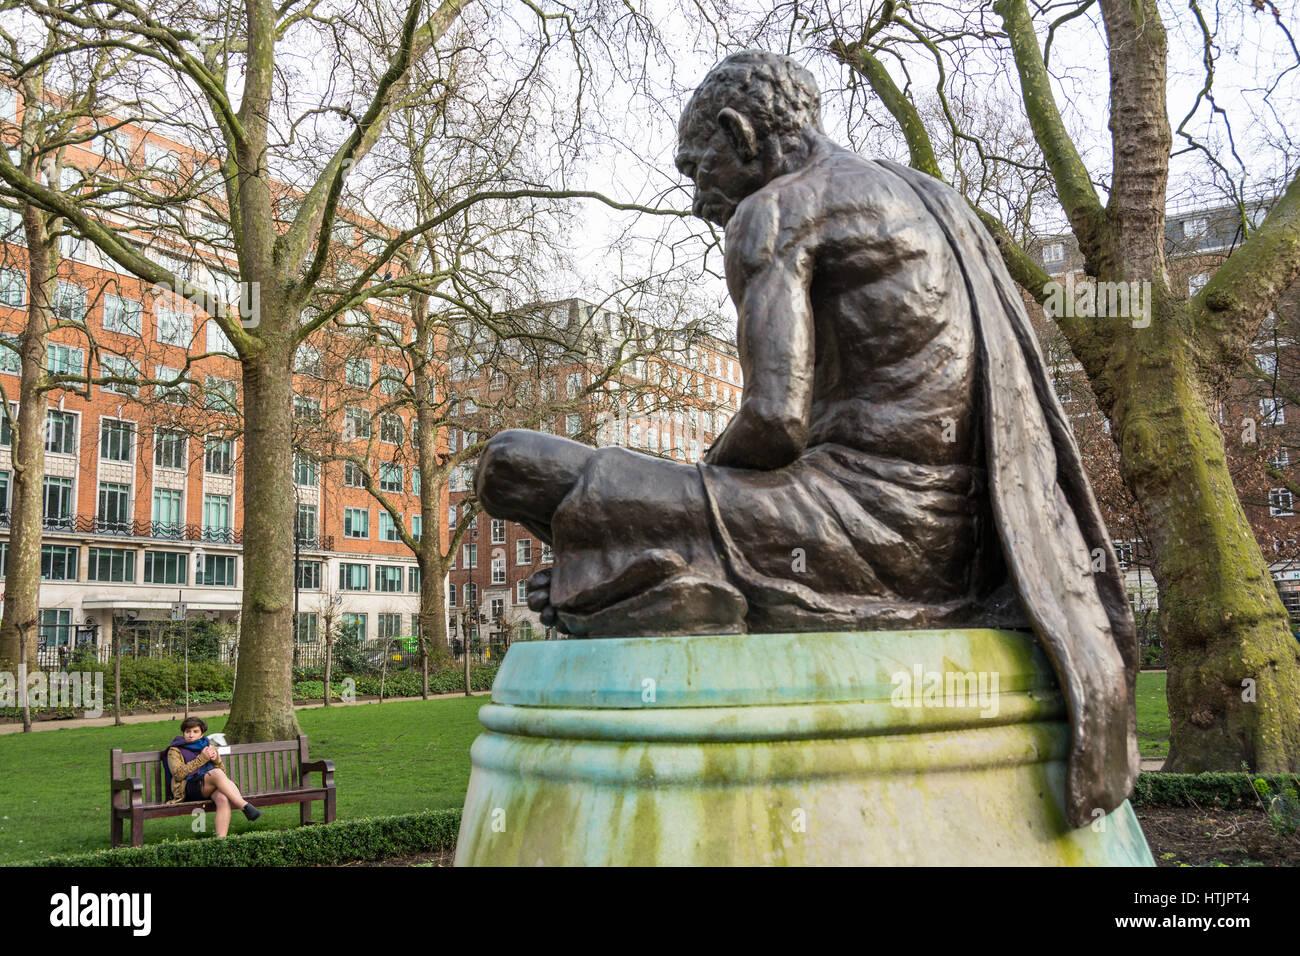 Statue of Mahatma Gandhi, sculpted by Fredda Brilliant, in Tavistock Square, London, UK. - Stock Image